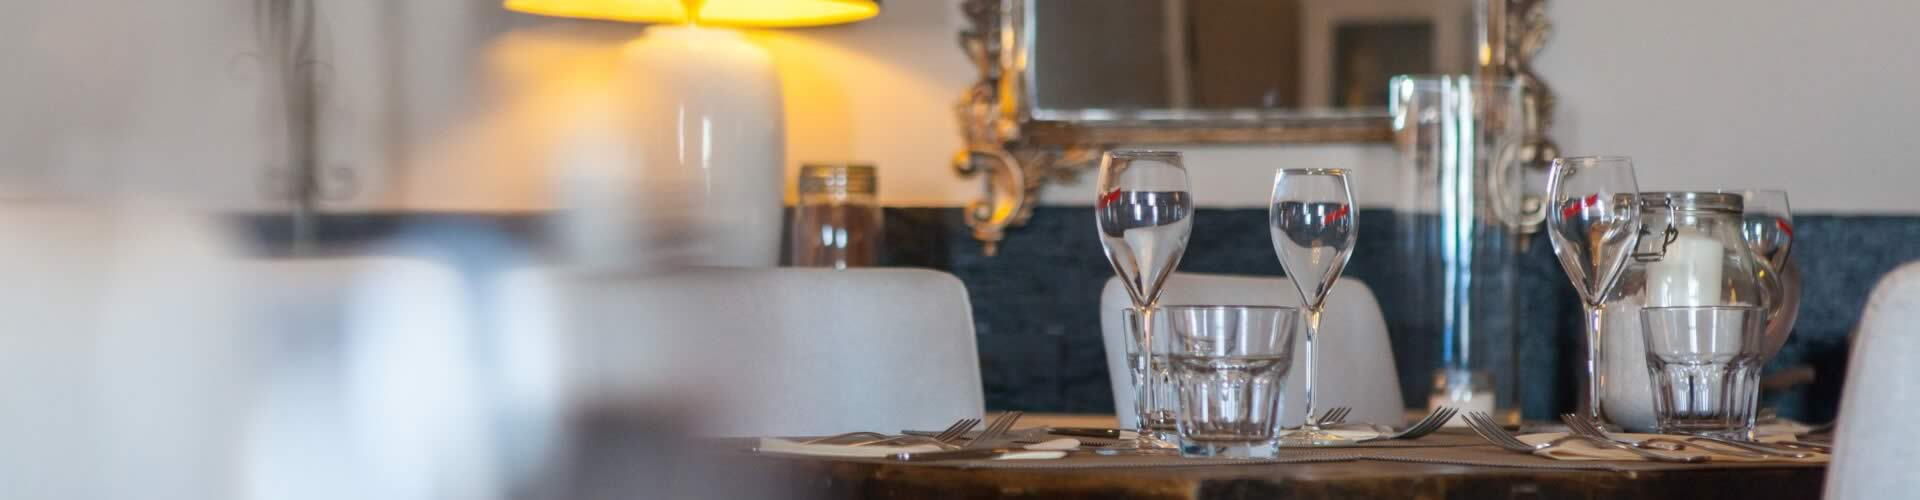 Il ristorante bagni medusa genova - Bagni chimici genova ...